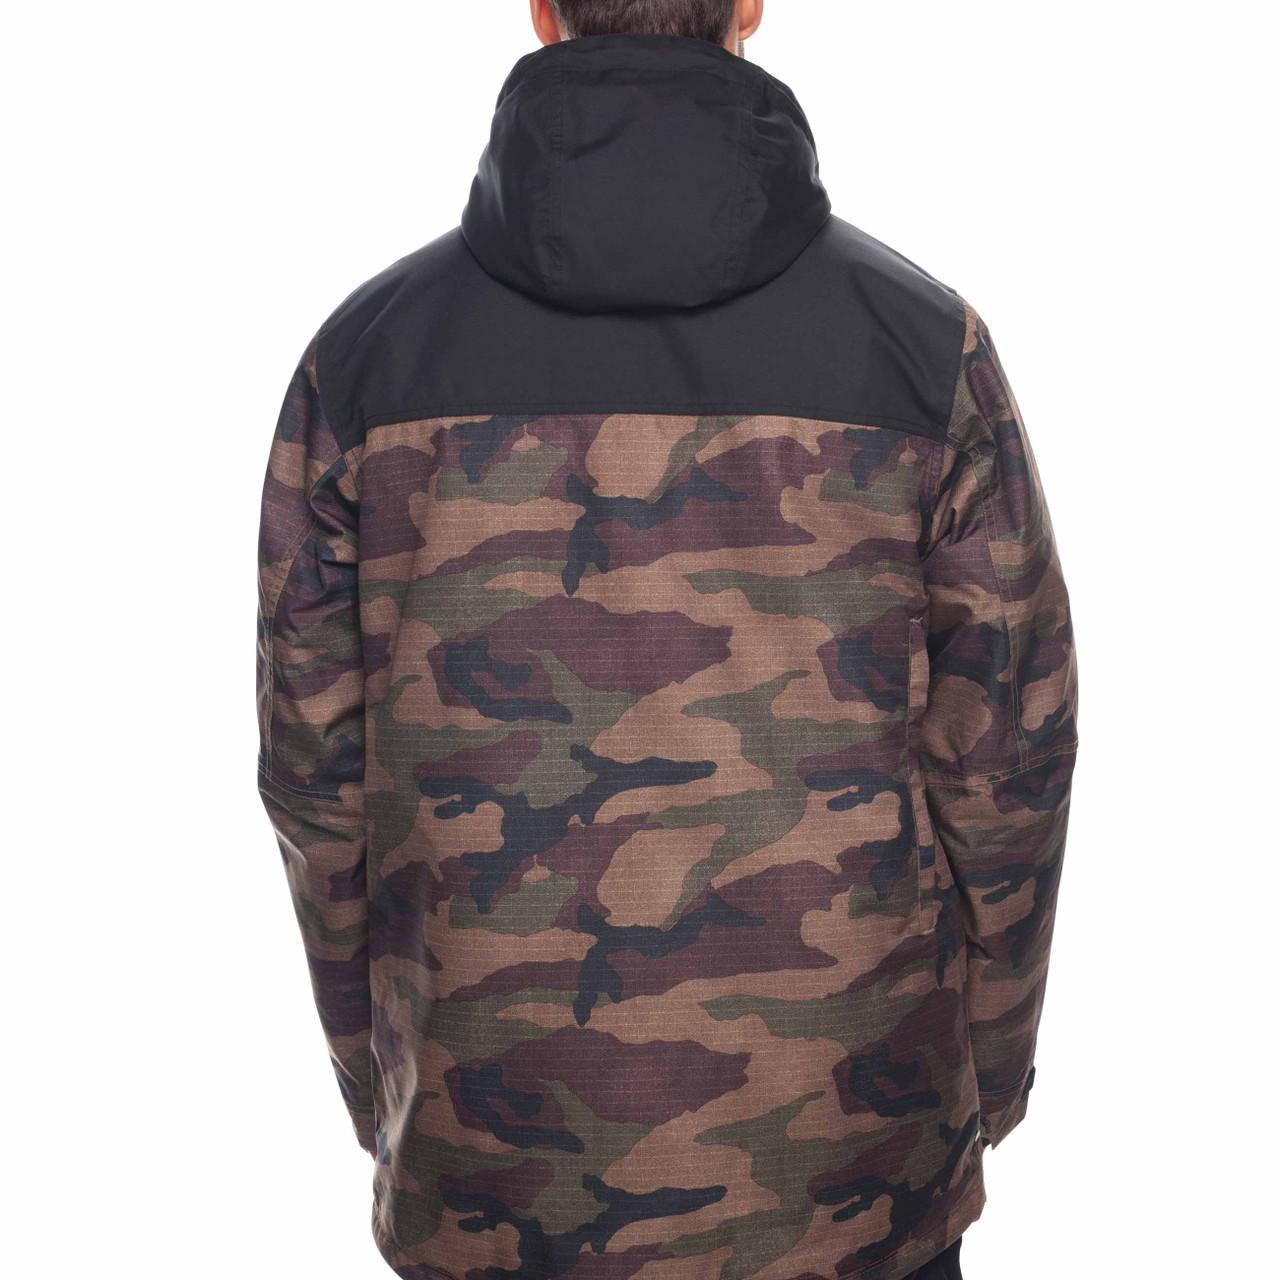 508fc76a7 686 Mens Sixer Insulated Ski Snowboard Jacket Dark Camo Colorblock ...